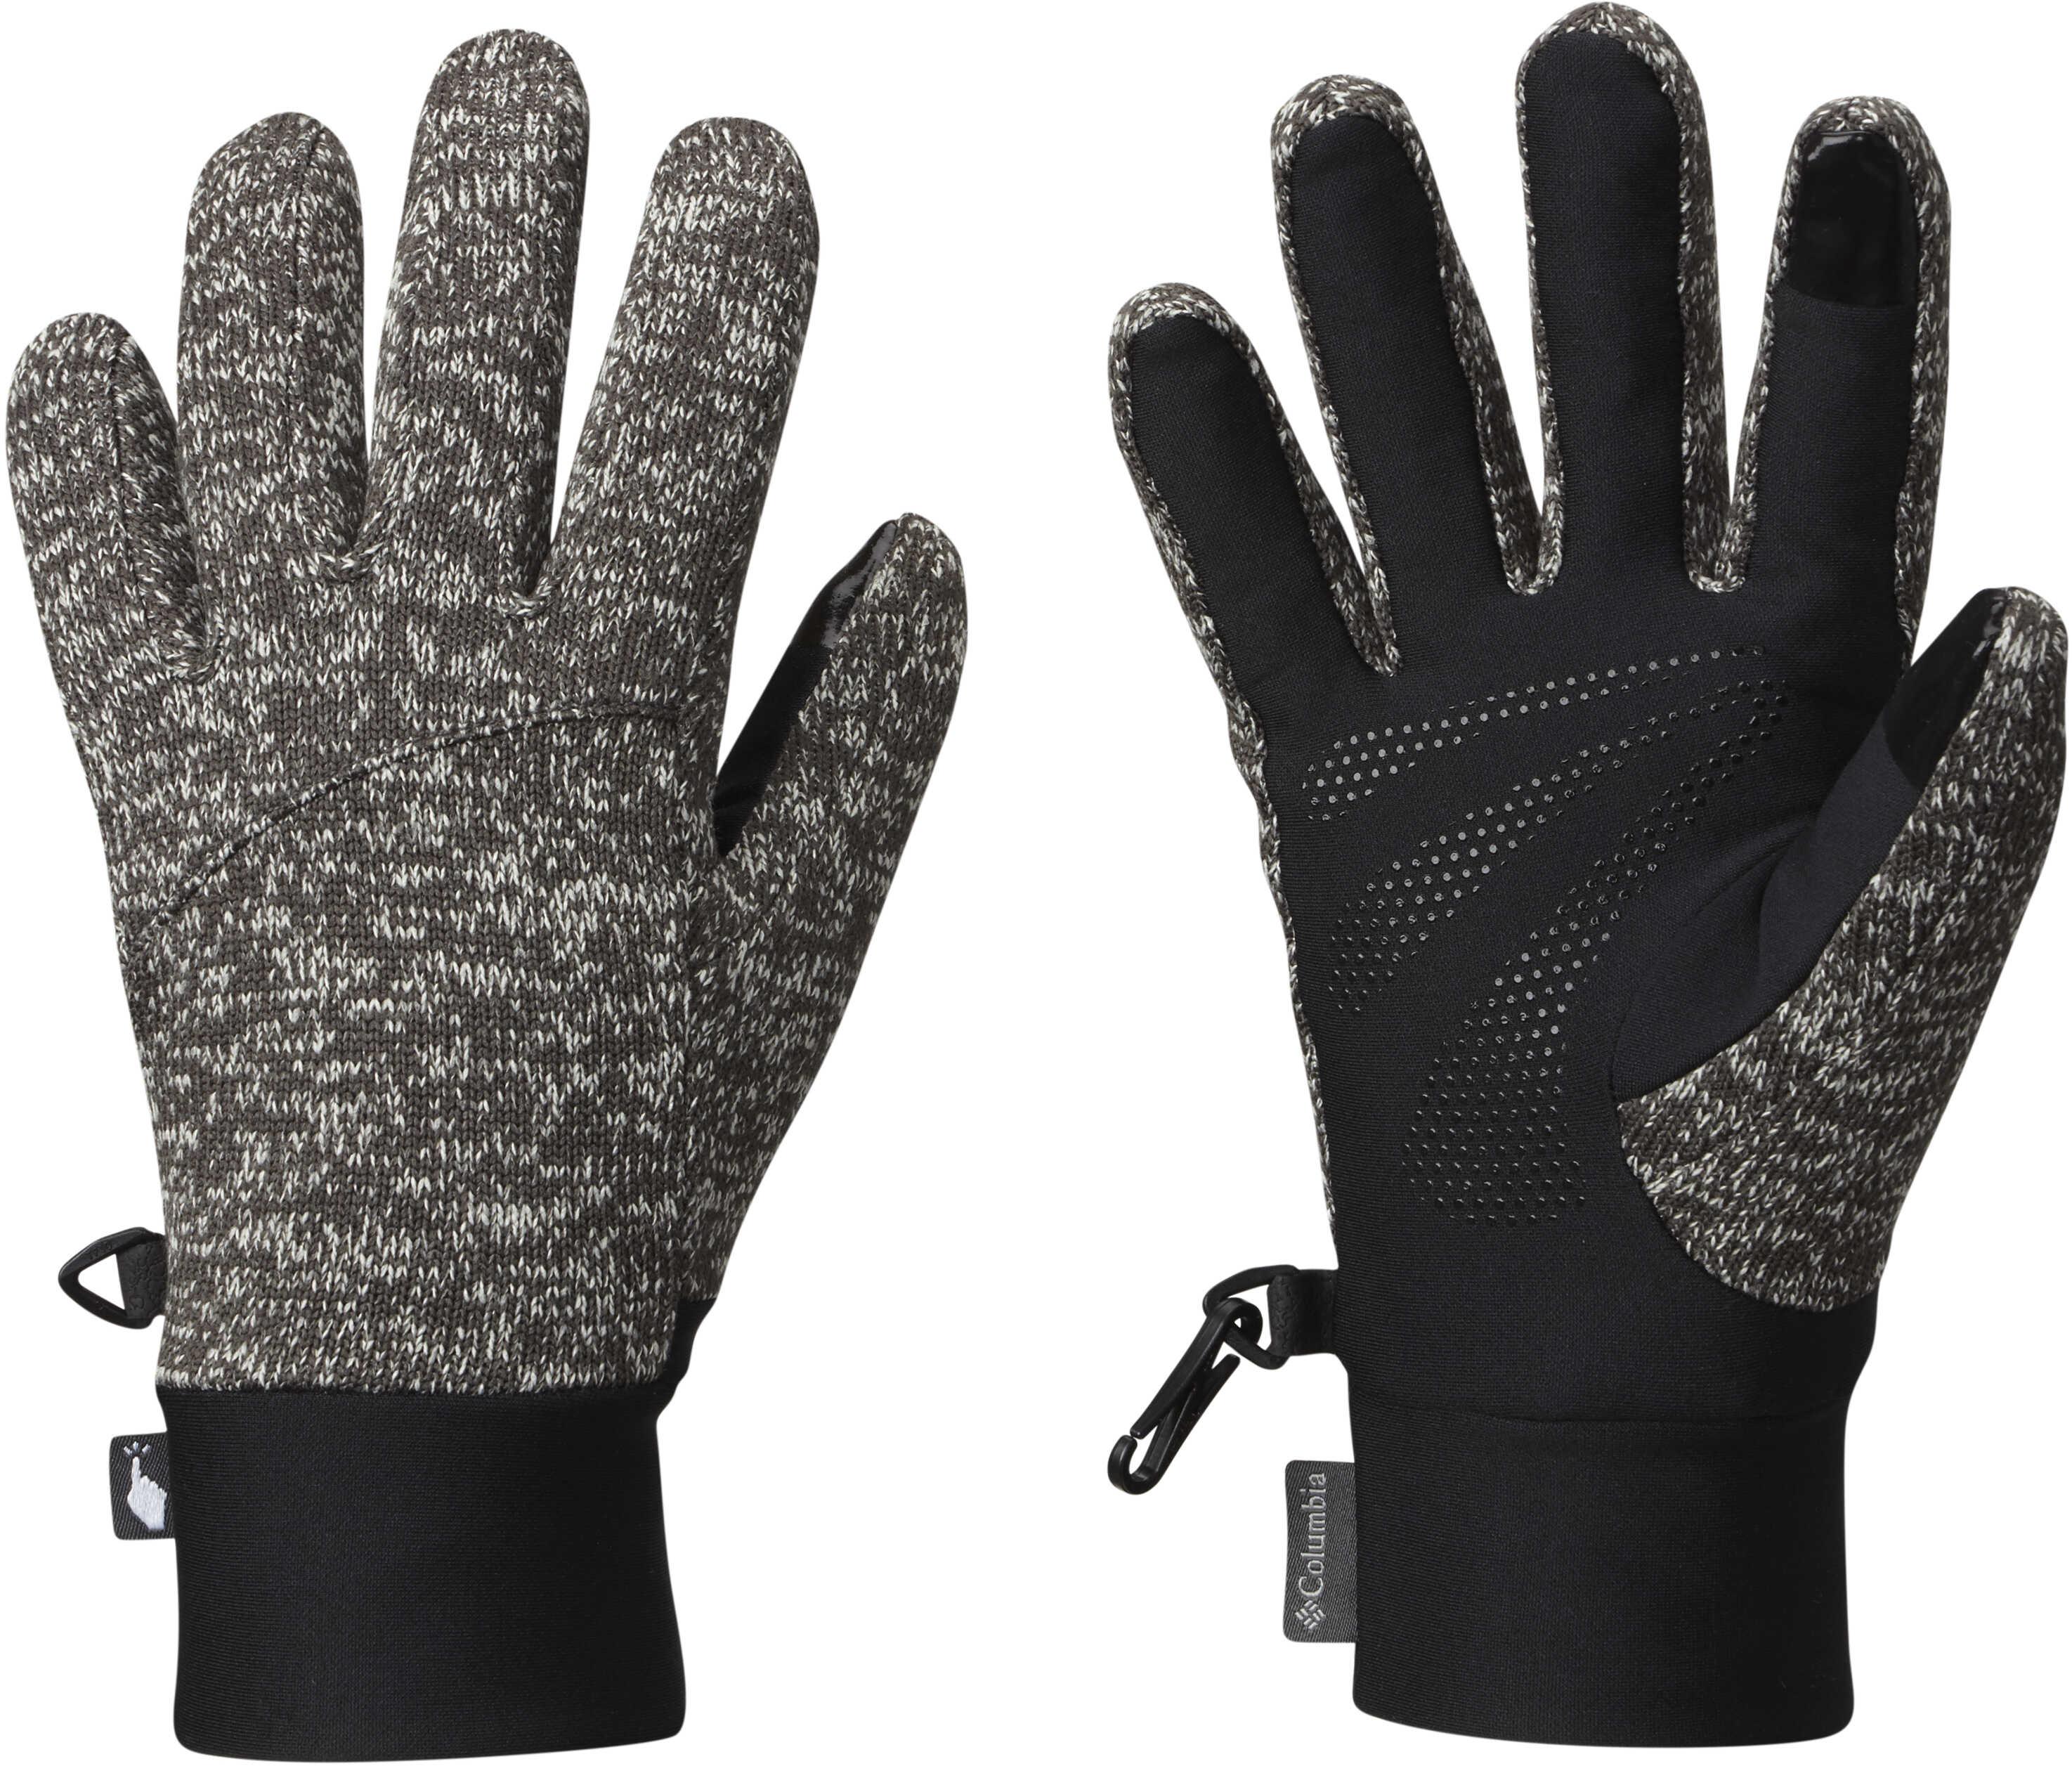 Columbia Darling Days Glove-Shark,Black Shark,Black